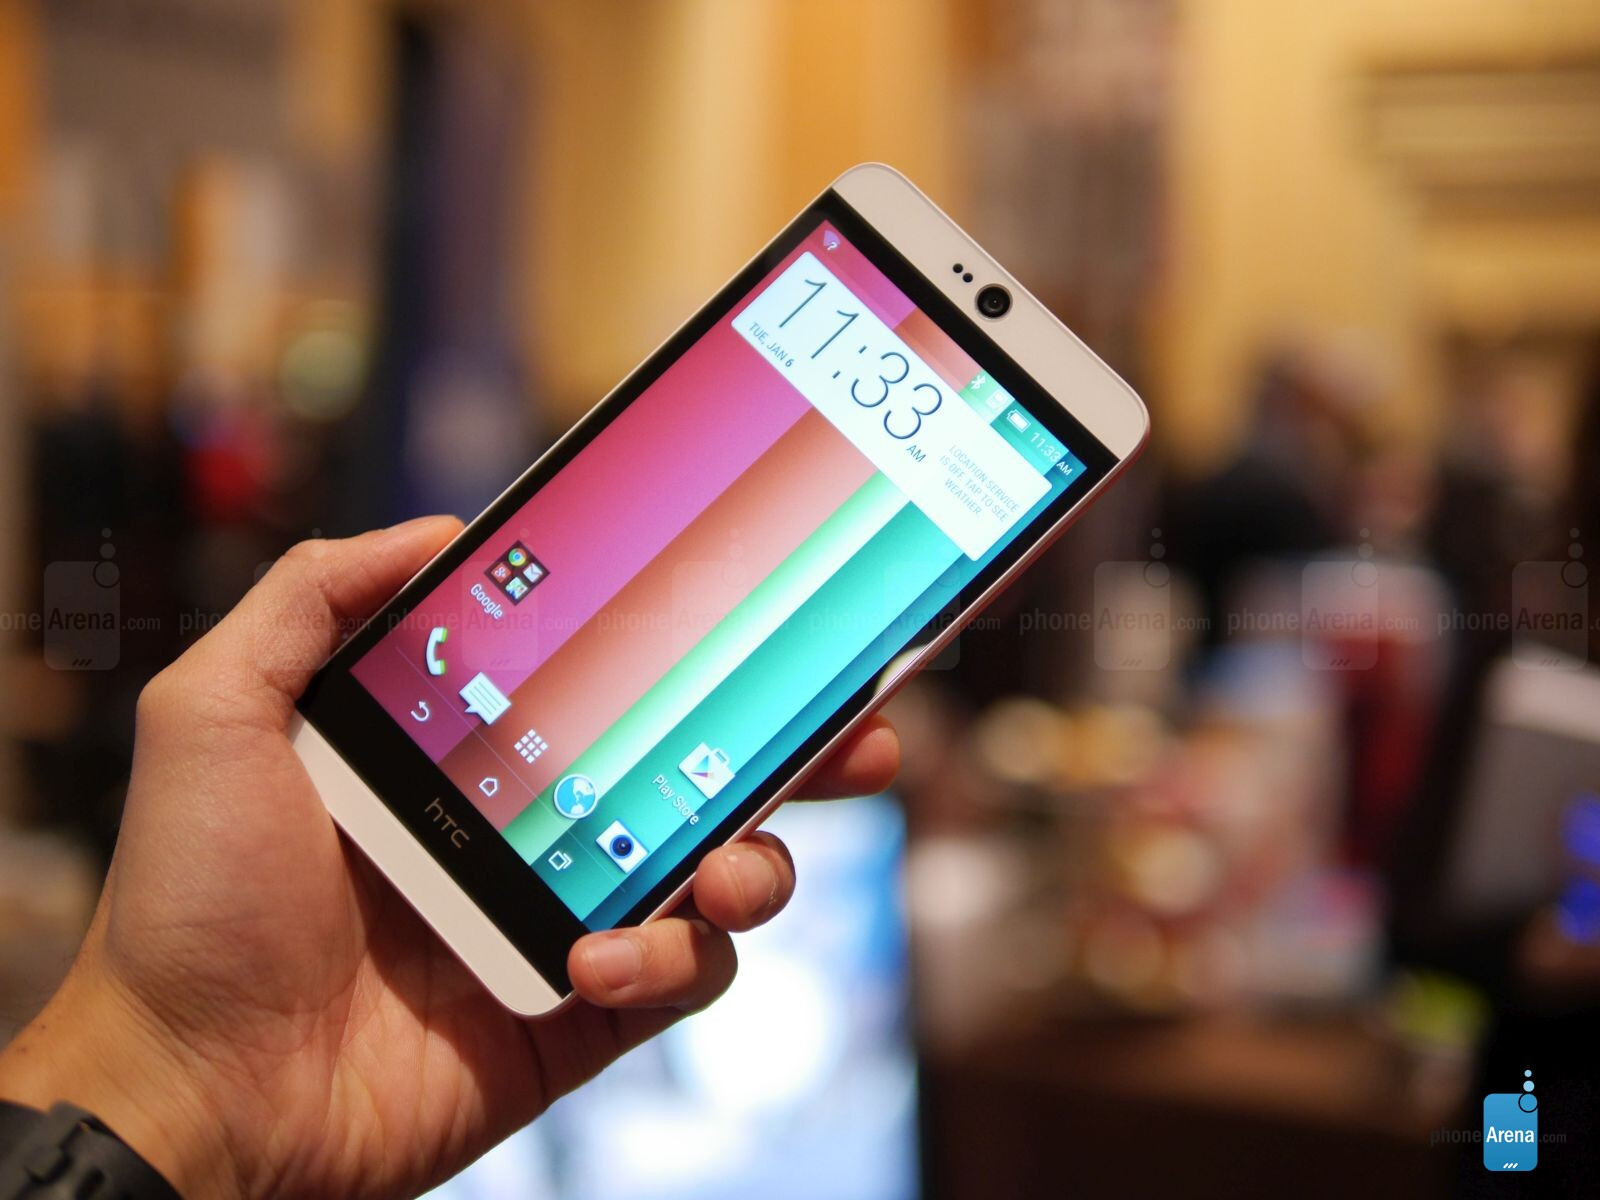 HTC Desire 826 hands-on - HTC Desire 826 hands-on